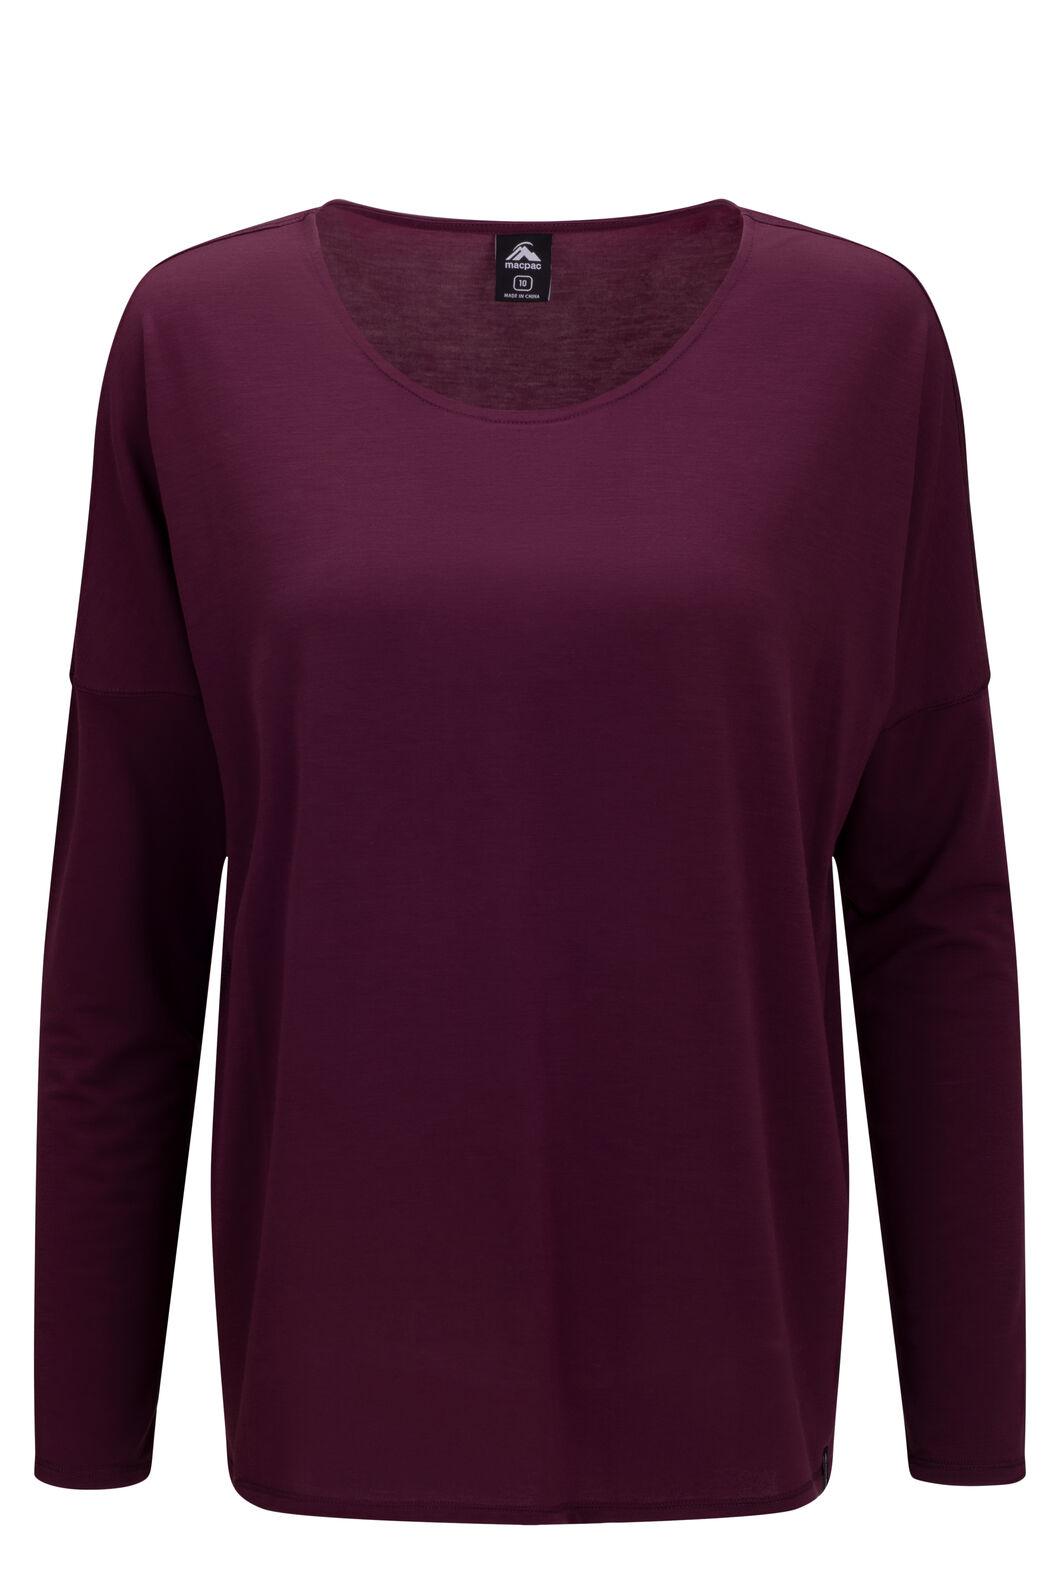 Macpac Women's Eva Long Sleeve Tee, Grape Wine, hi-res